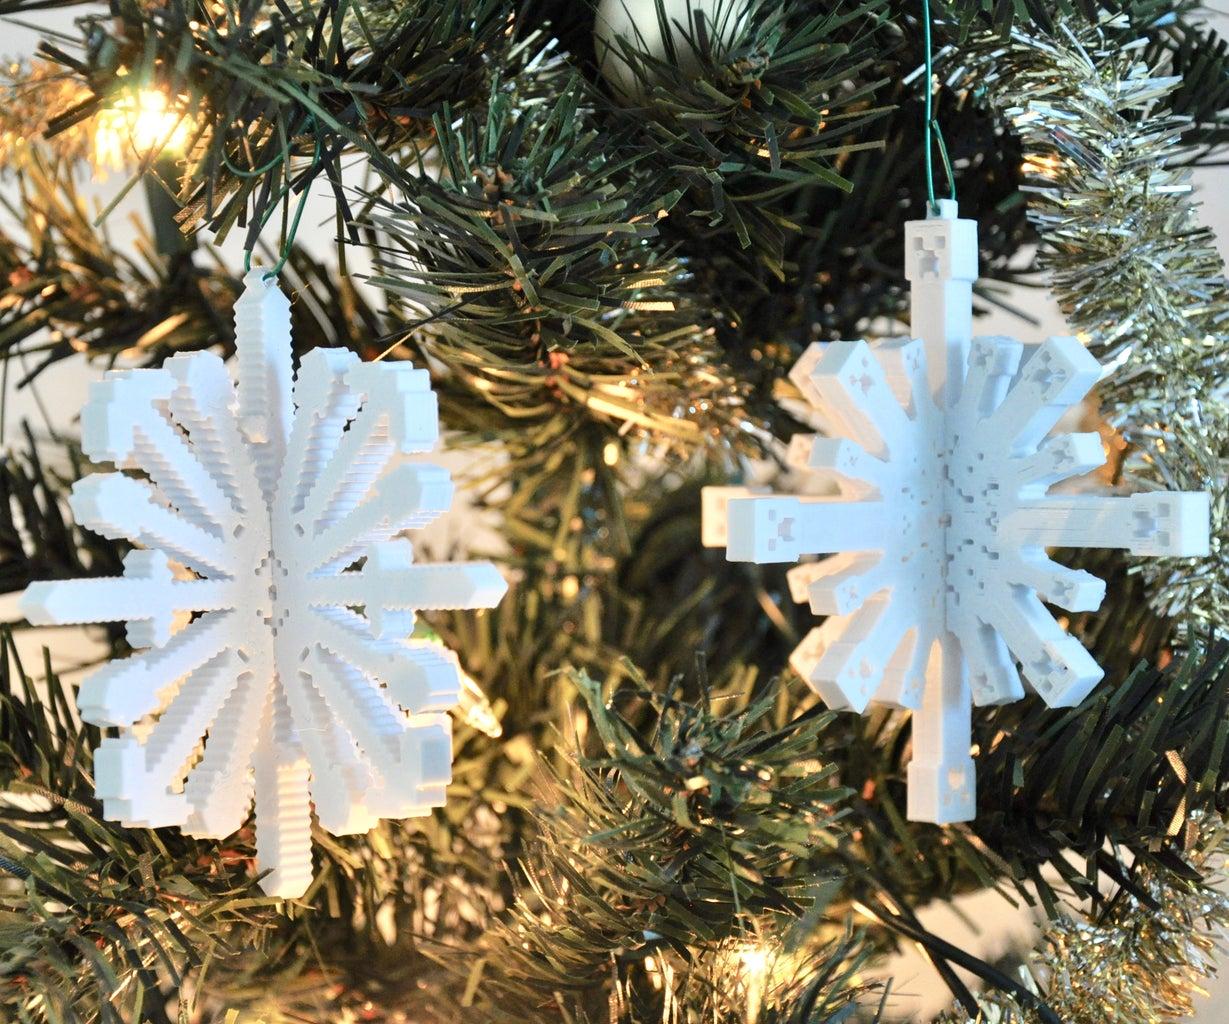 3D Printed Minecraft Snowflake Ornaments